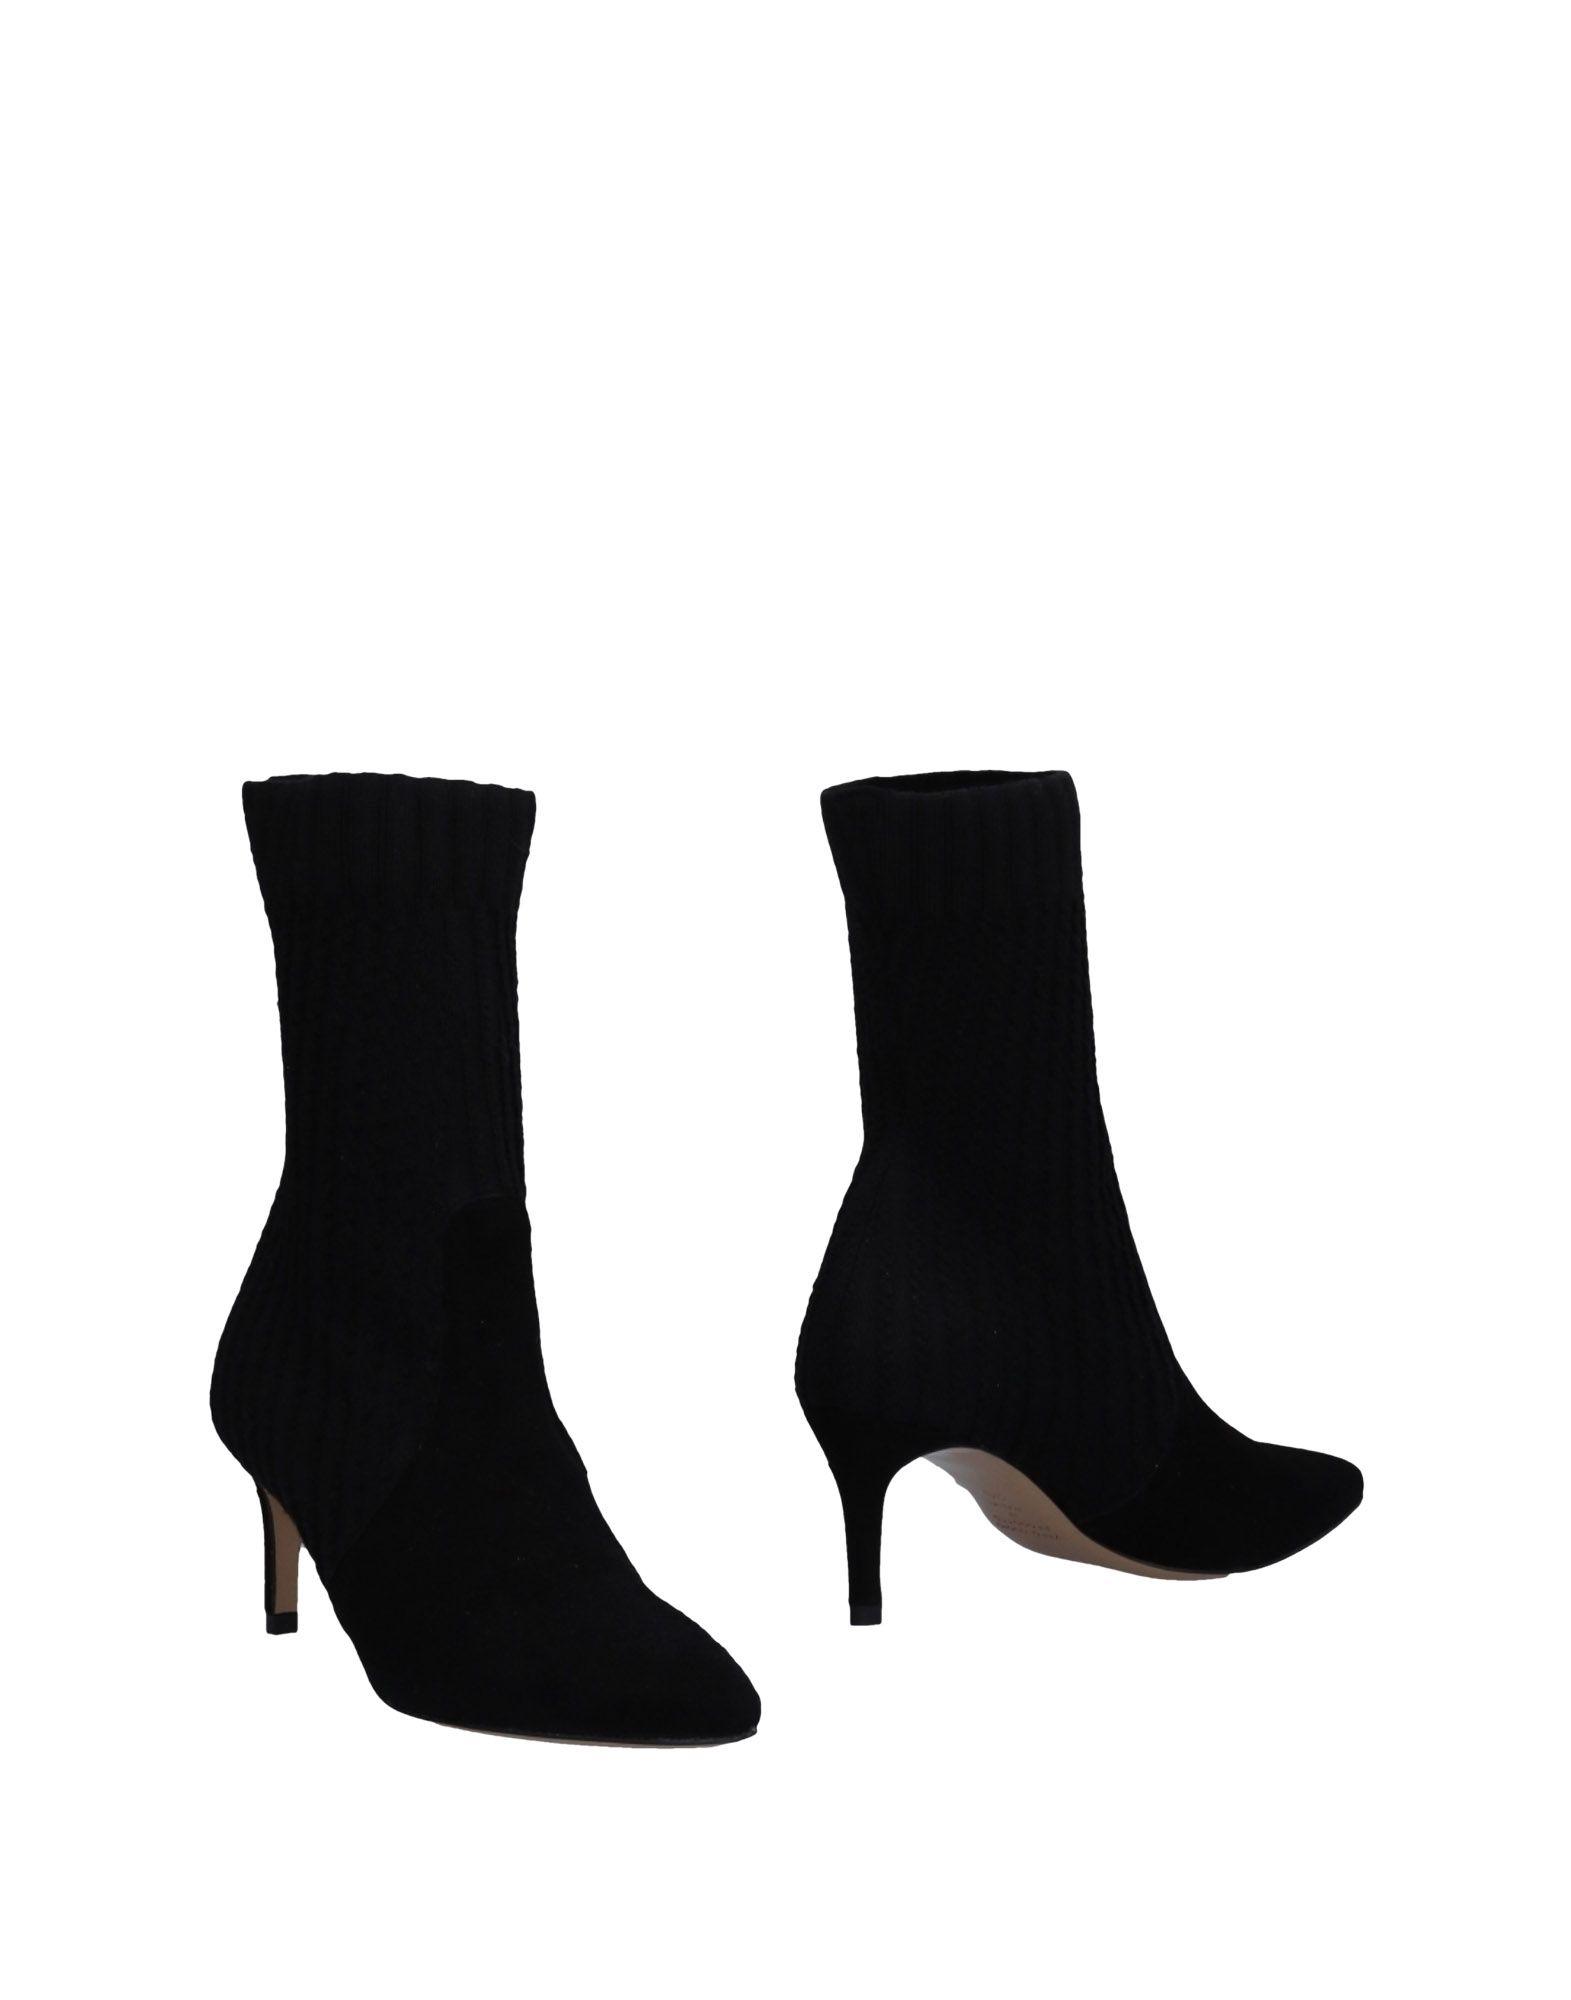 Twiggy Stiefelette Damen beliebte  11473992HT Gute Qualität beliebte Damen Schuhe 04e360